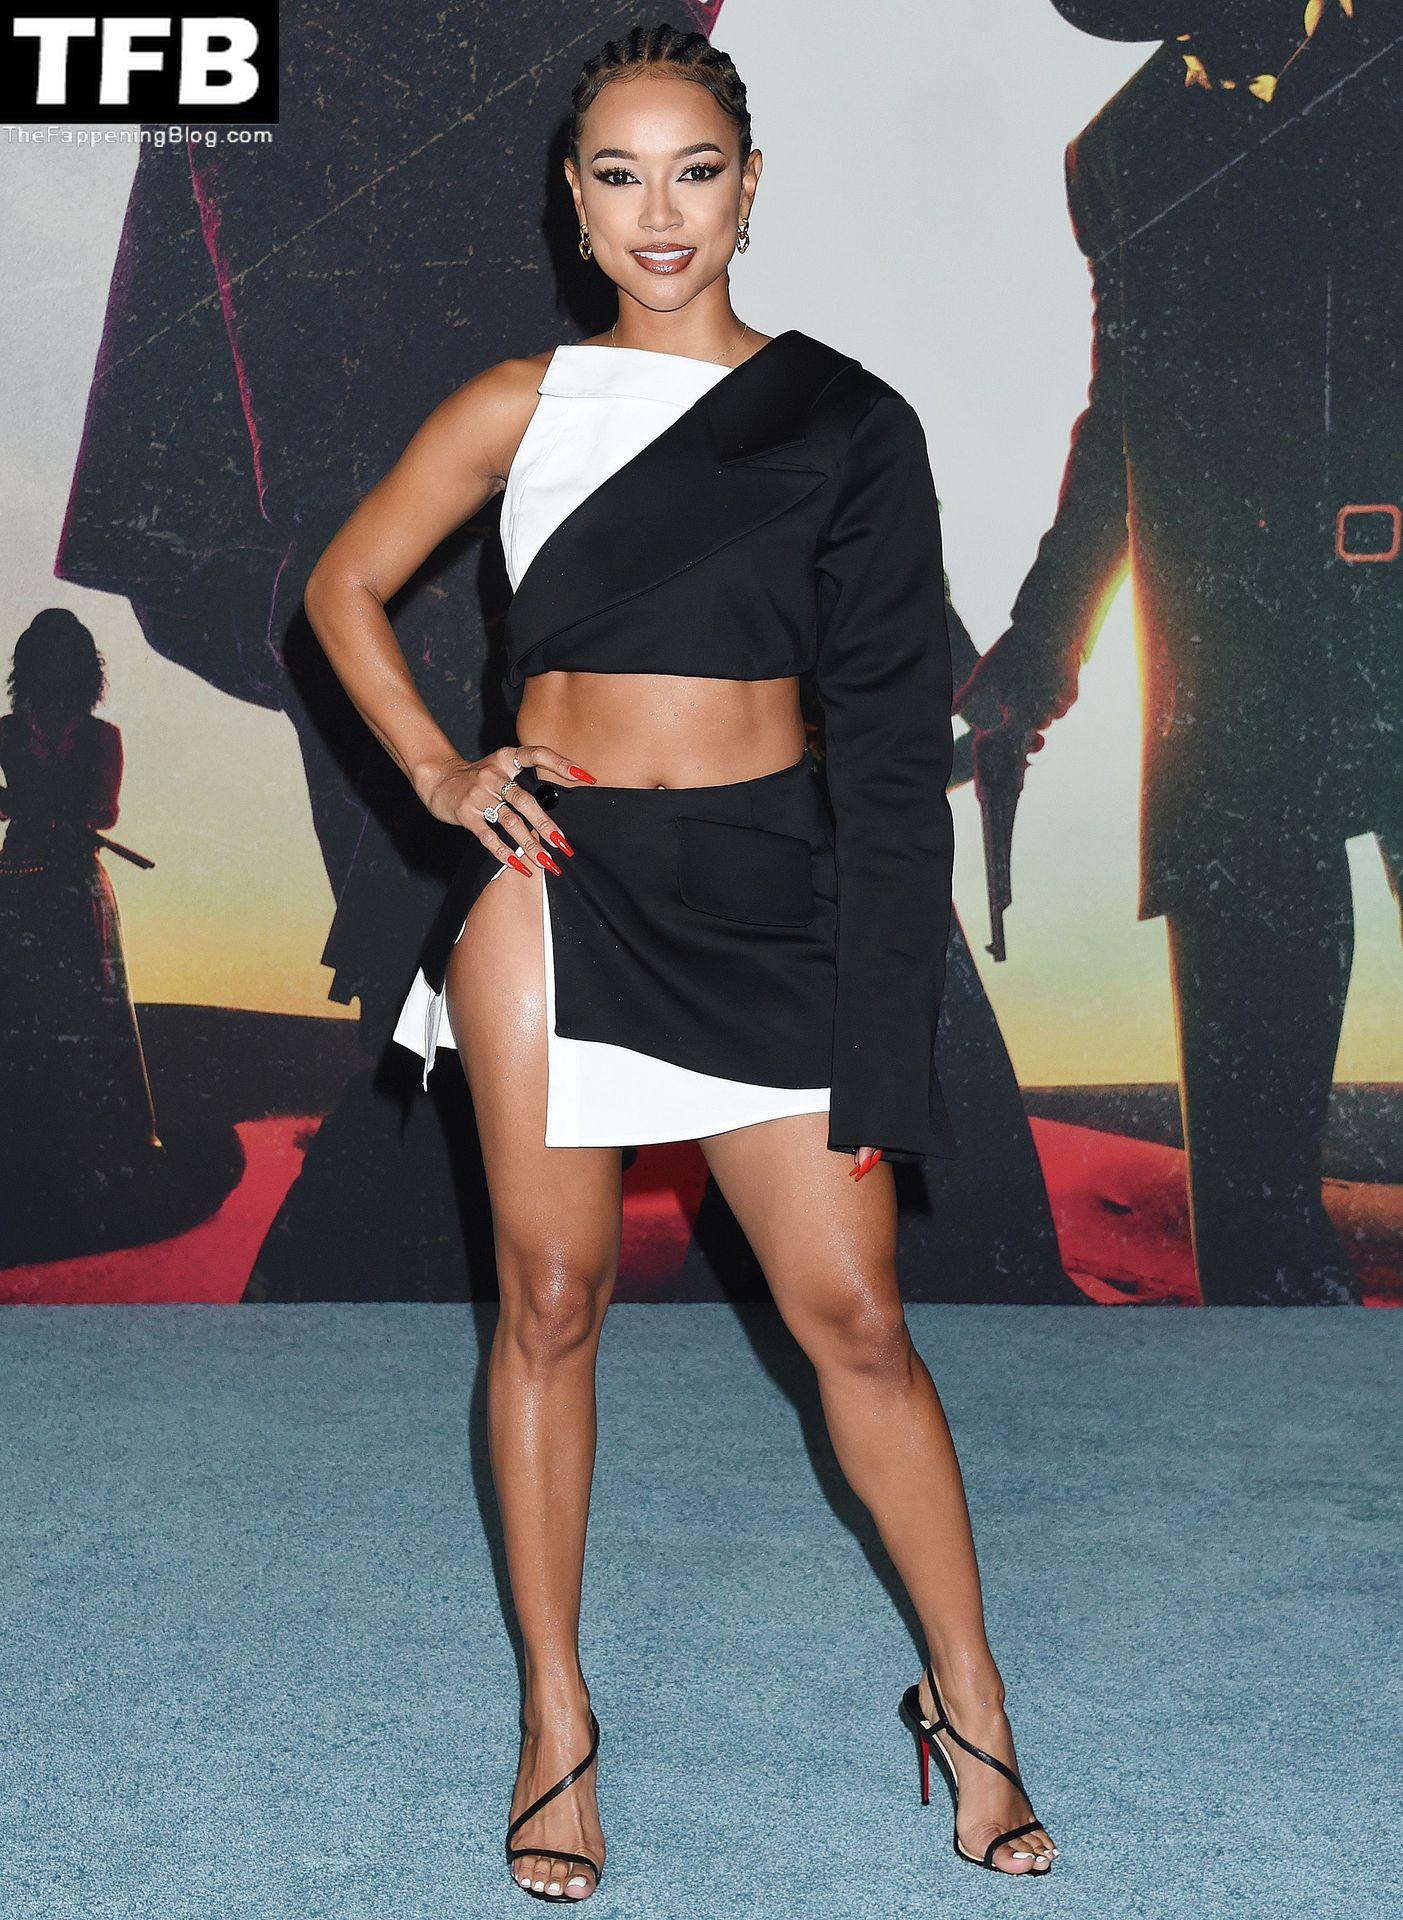 Karrueche-Tran-Sexy-Legs-Upskirt-The-Fappening-Blog-44.jpg